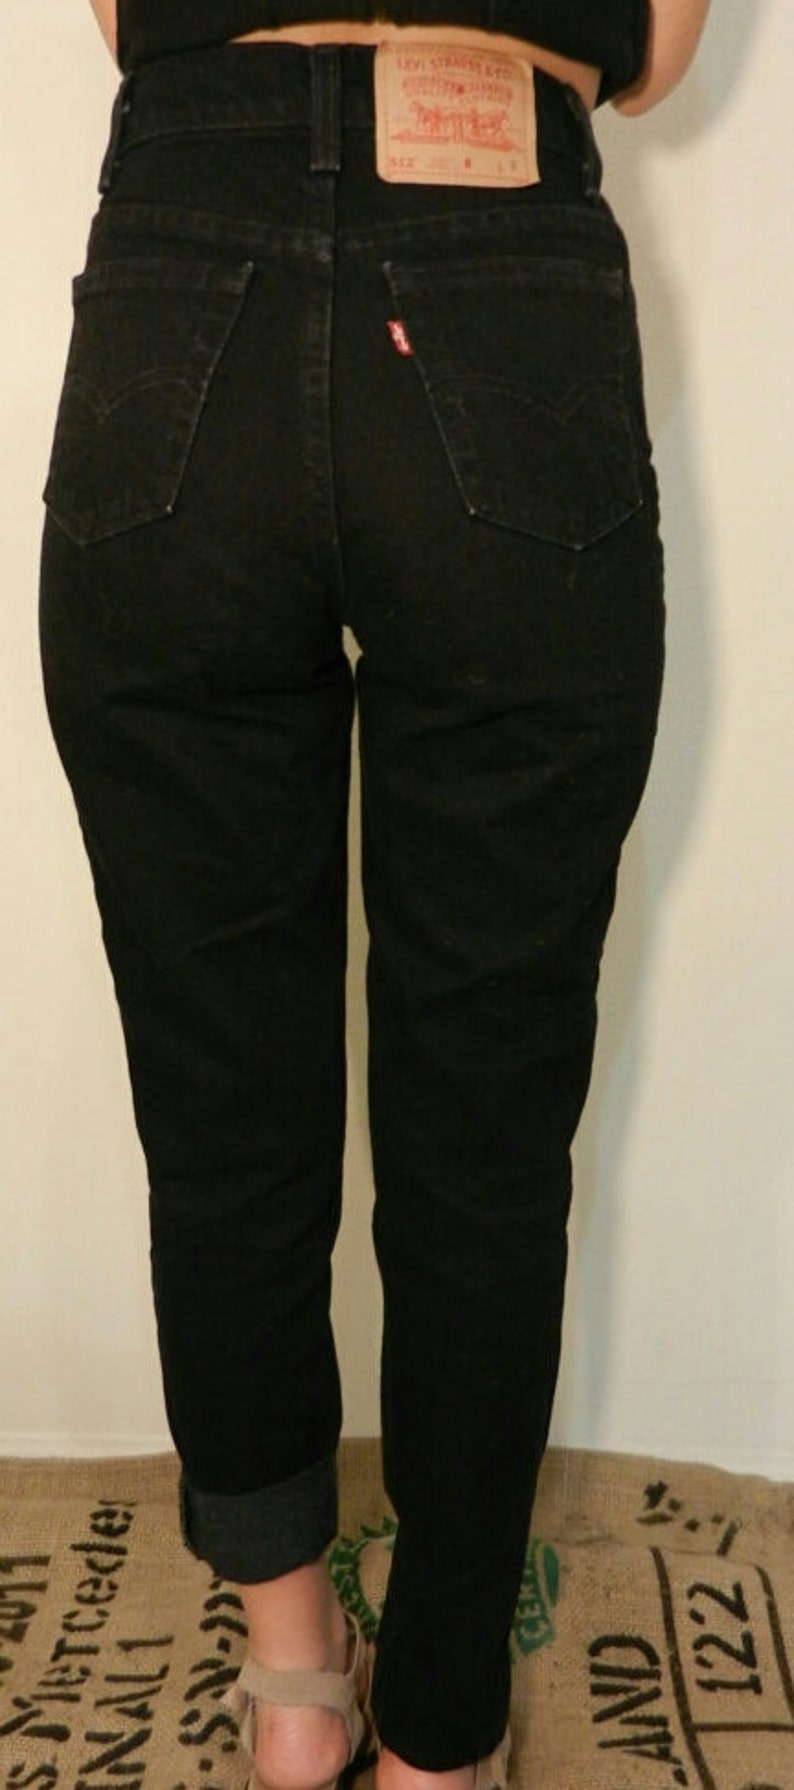 56f39c54c1 LEVI'S HIGH WAIST Vintage Jeans Black Denim Wash Gift | Etsy